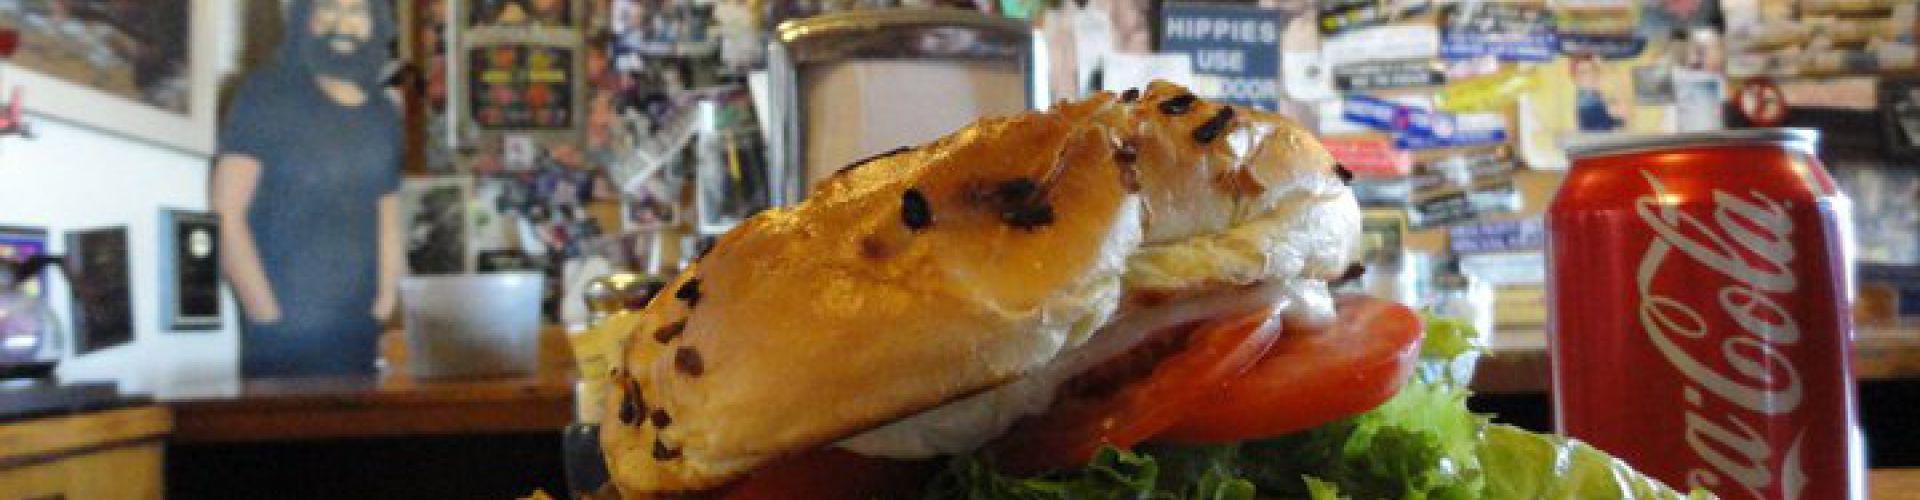 Big Kitchen Café - Casual - San Diego - Reviews - ellgeeBE